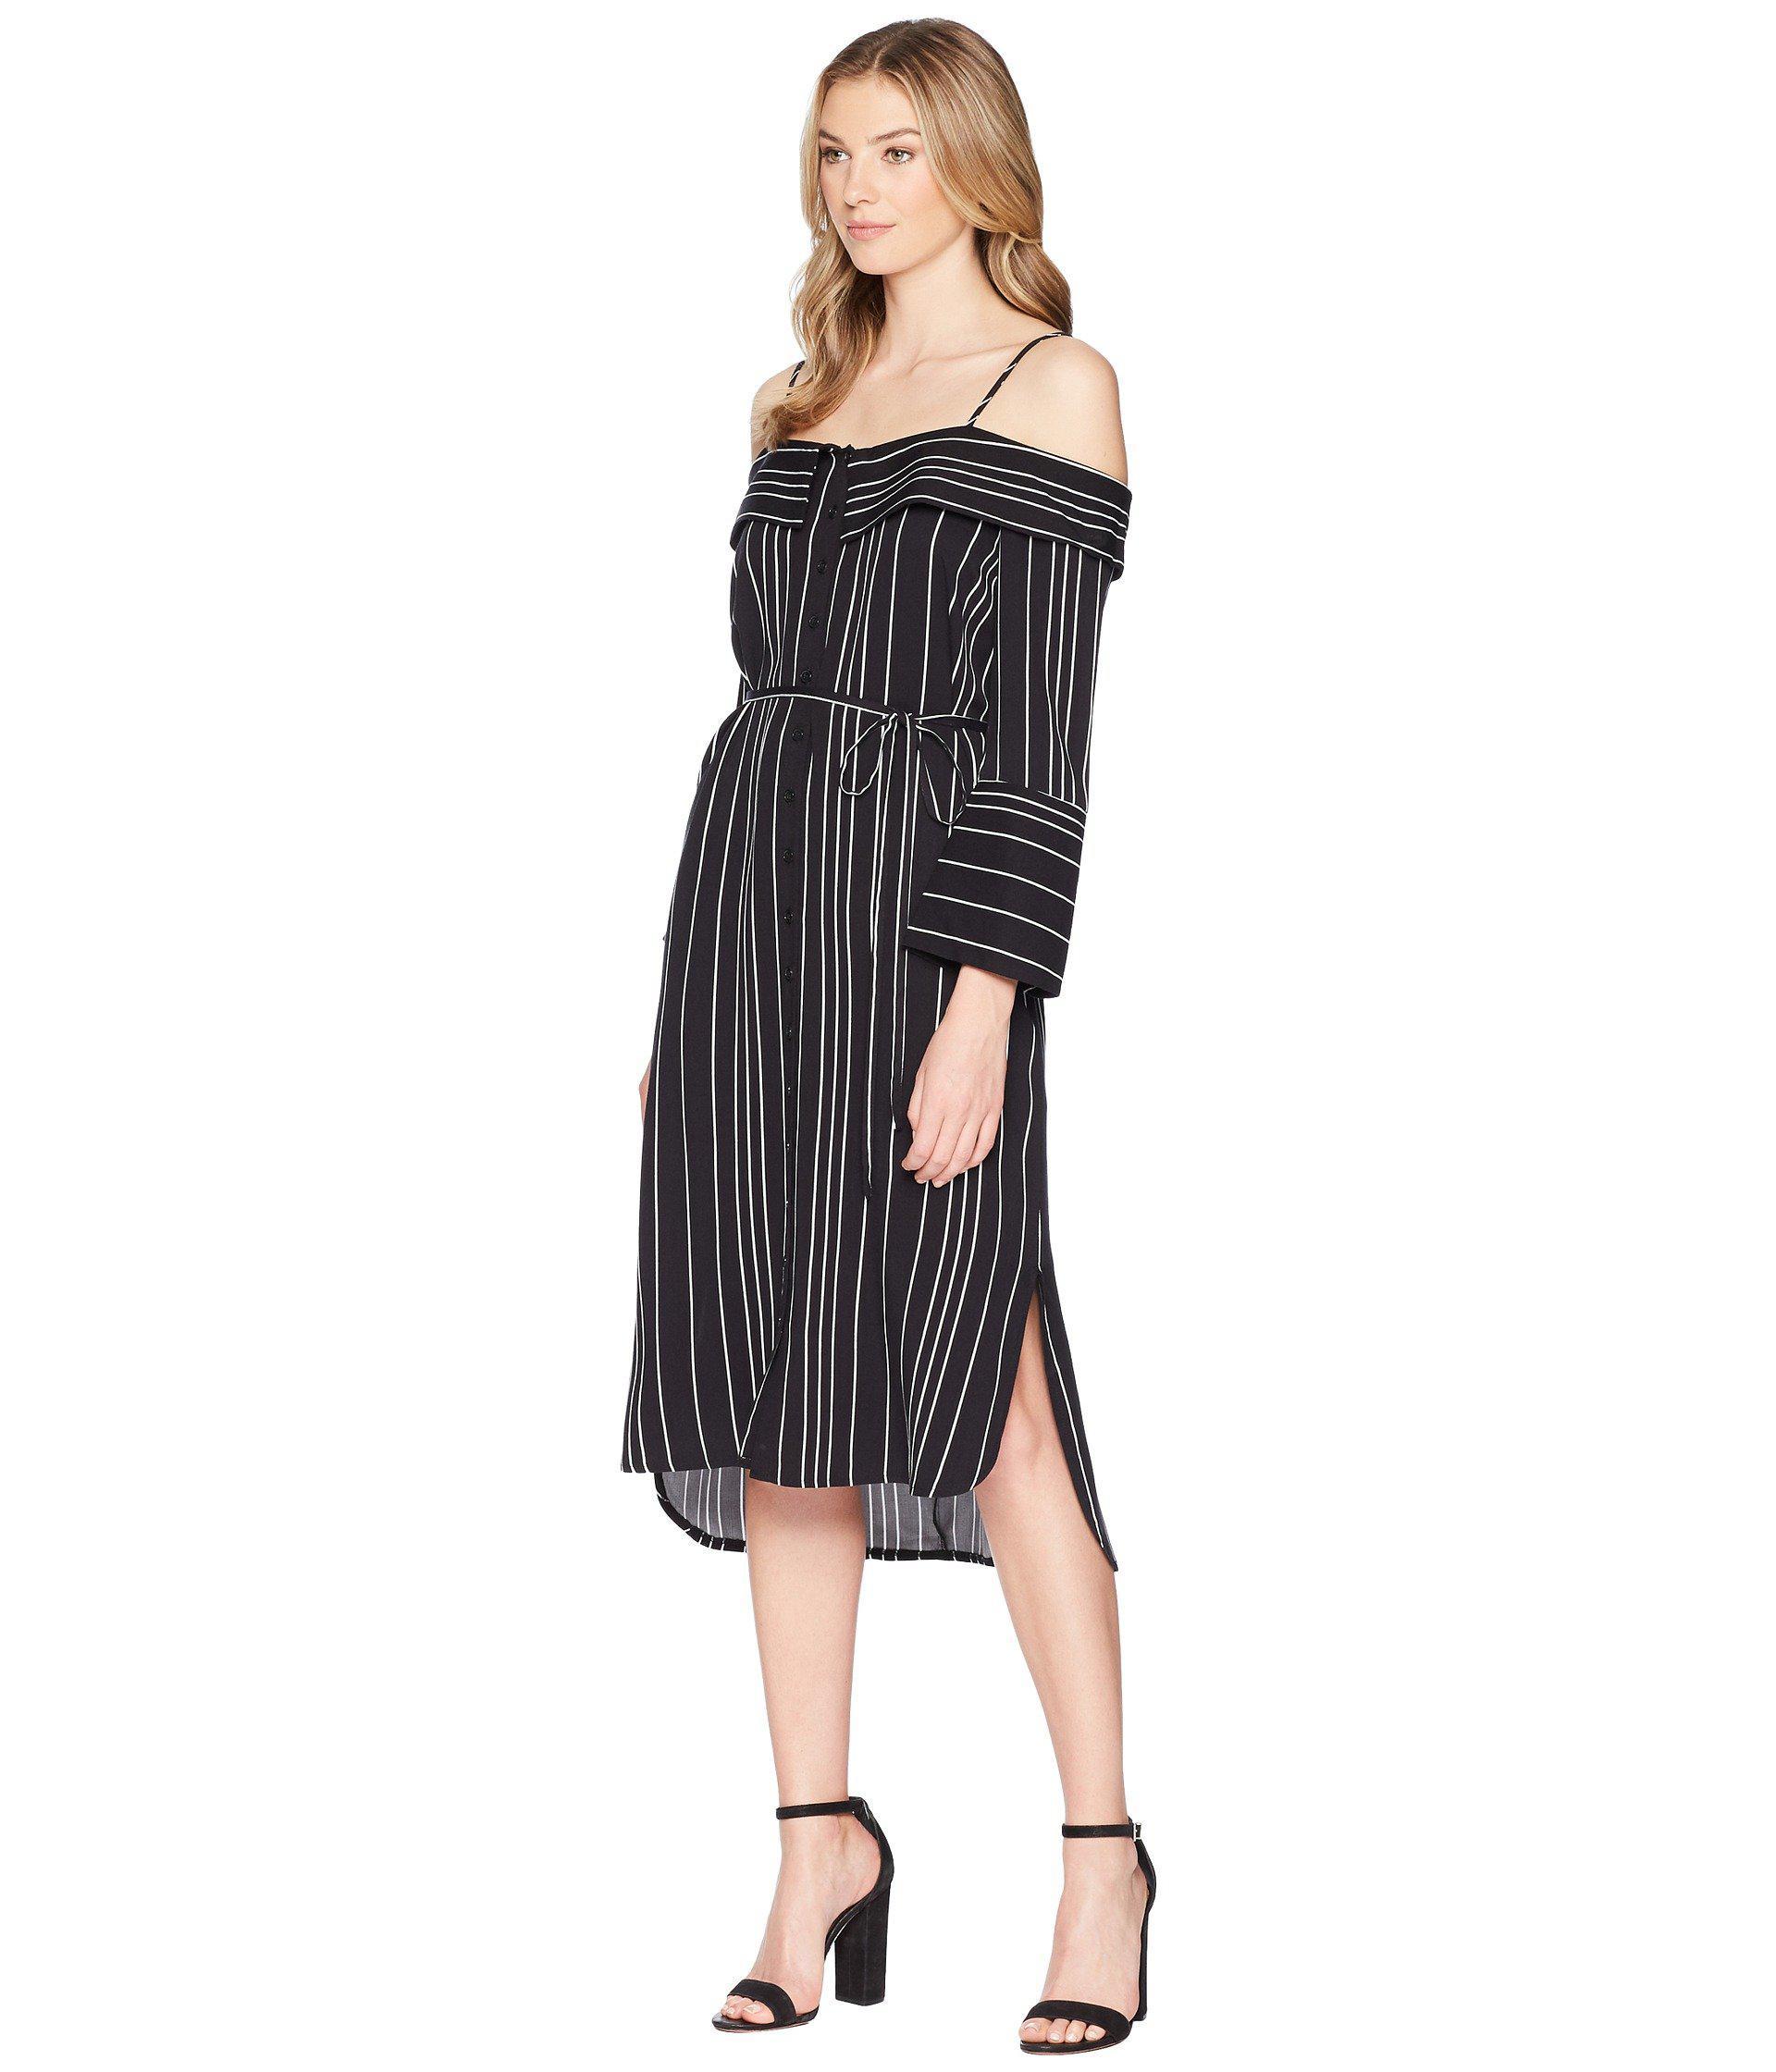 91da9dd84d66 Lyst - Bardot Effie Shirtdress in Black - Save 32%